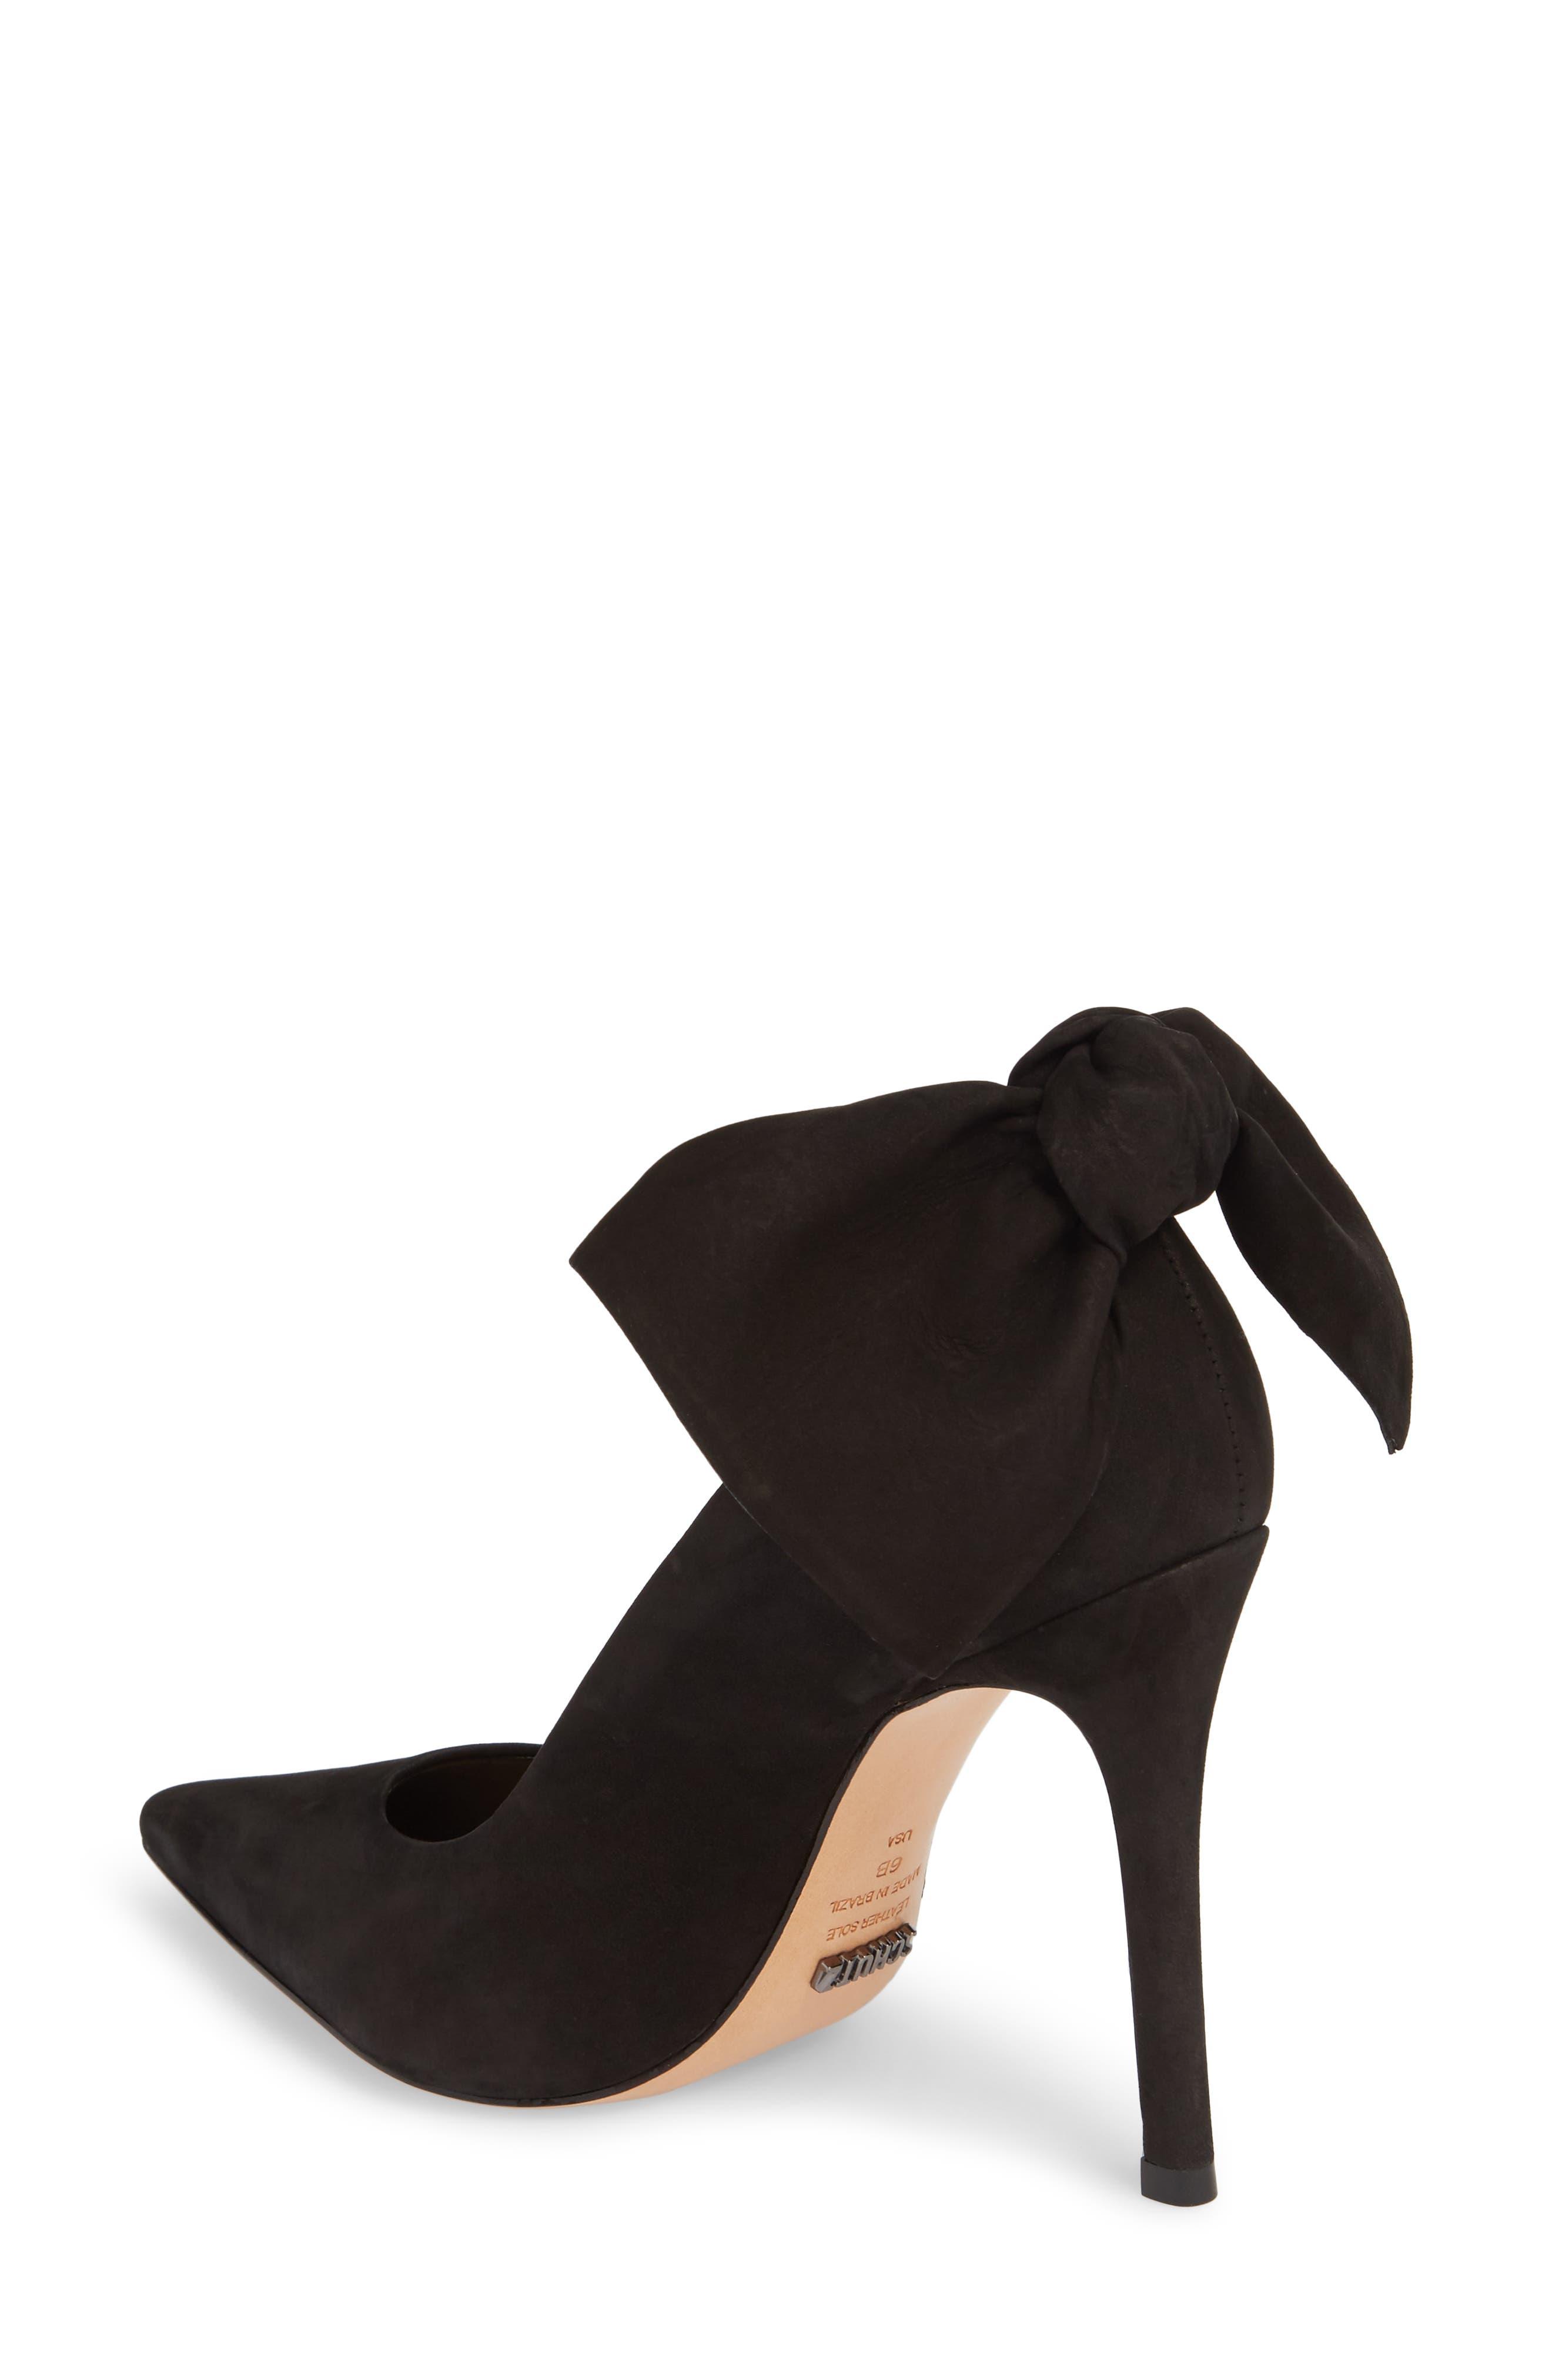 Blasiana Bow Pump,                             Alternate thumbnail 2, color,                             Black Nubuck Leather